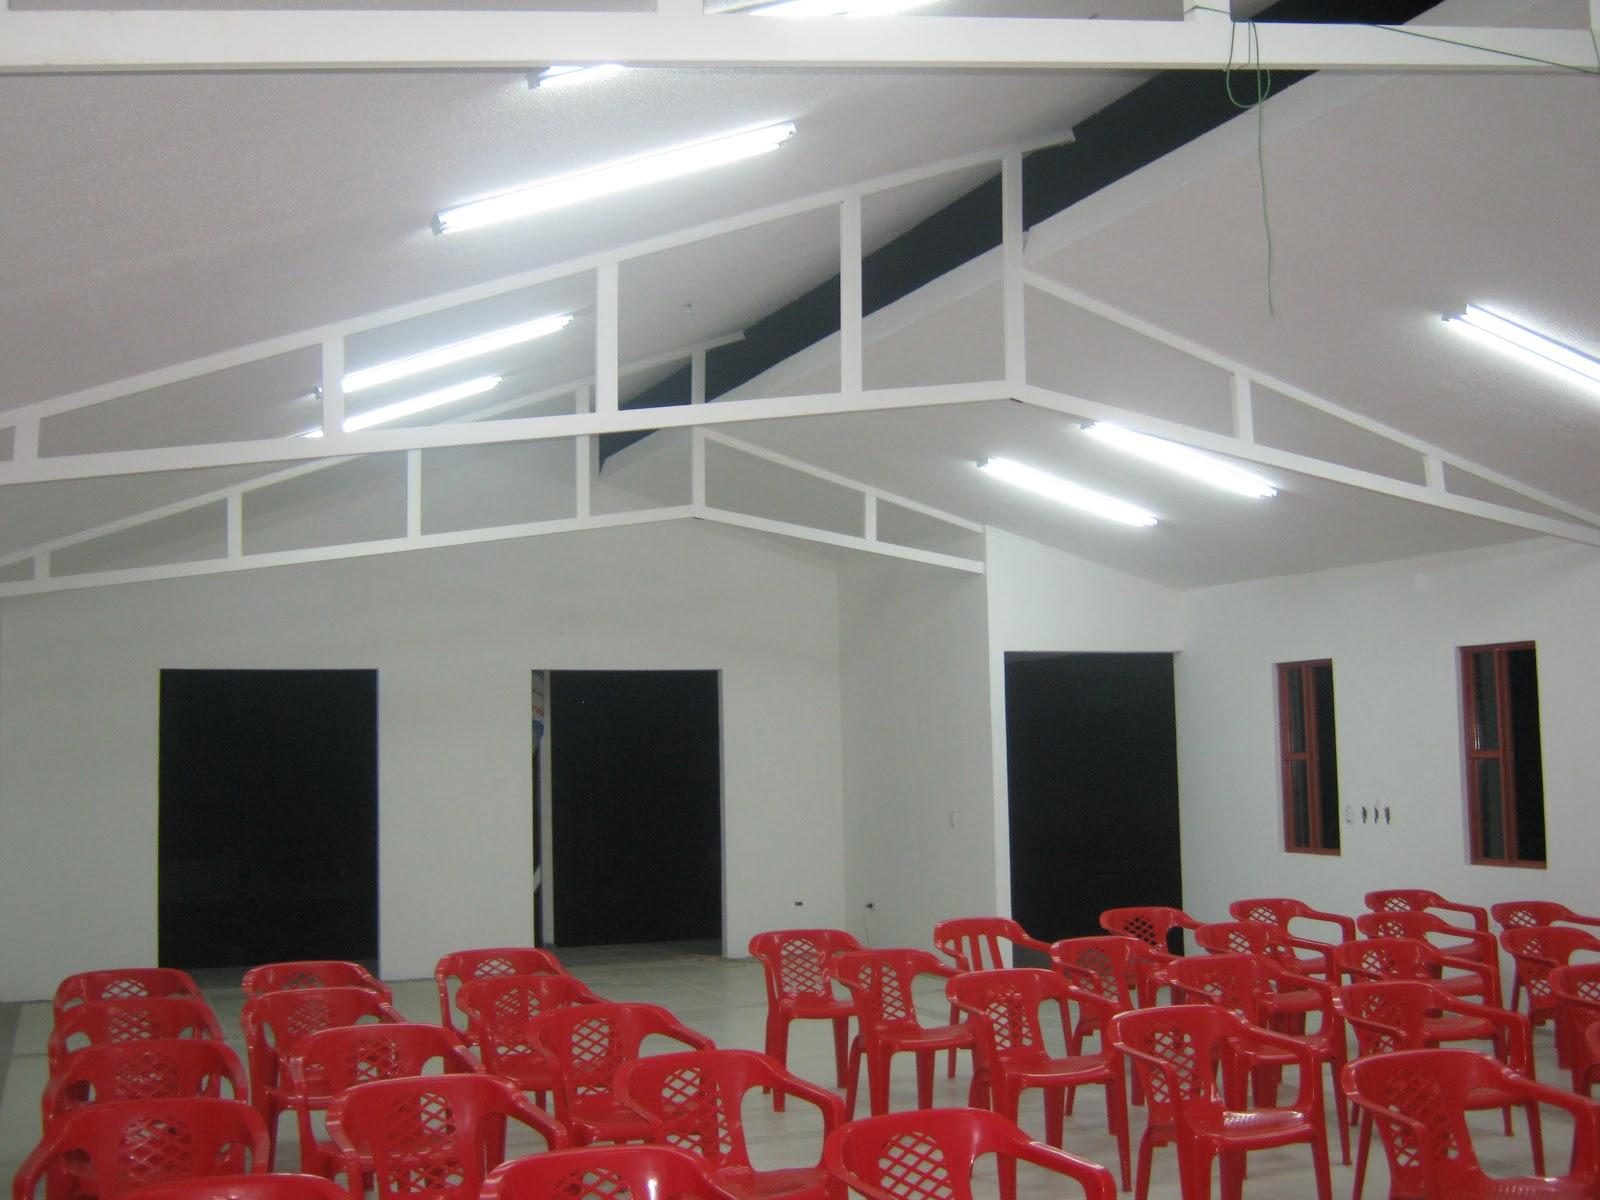 constru f cil drywall 2011 09 18. Black Bedroom Furniture Sets. Home Design Ideas